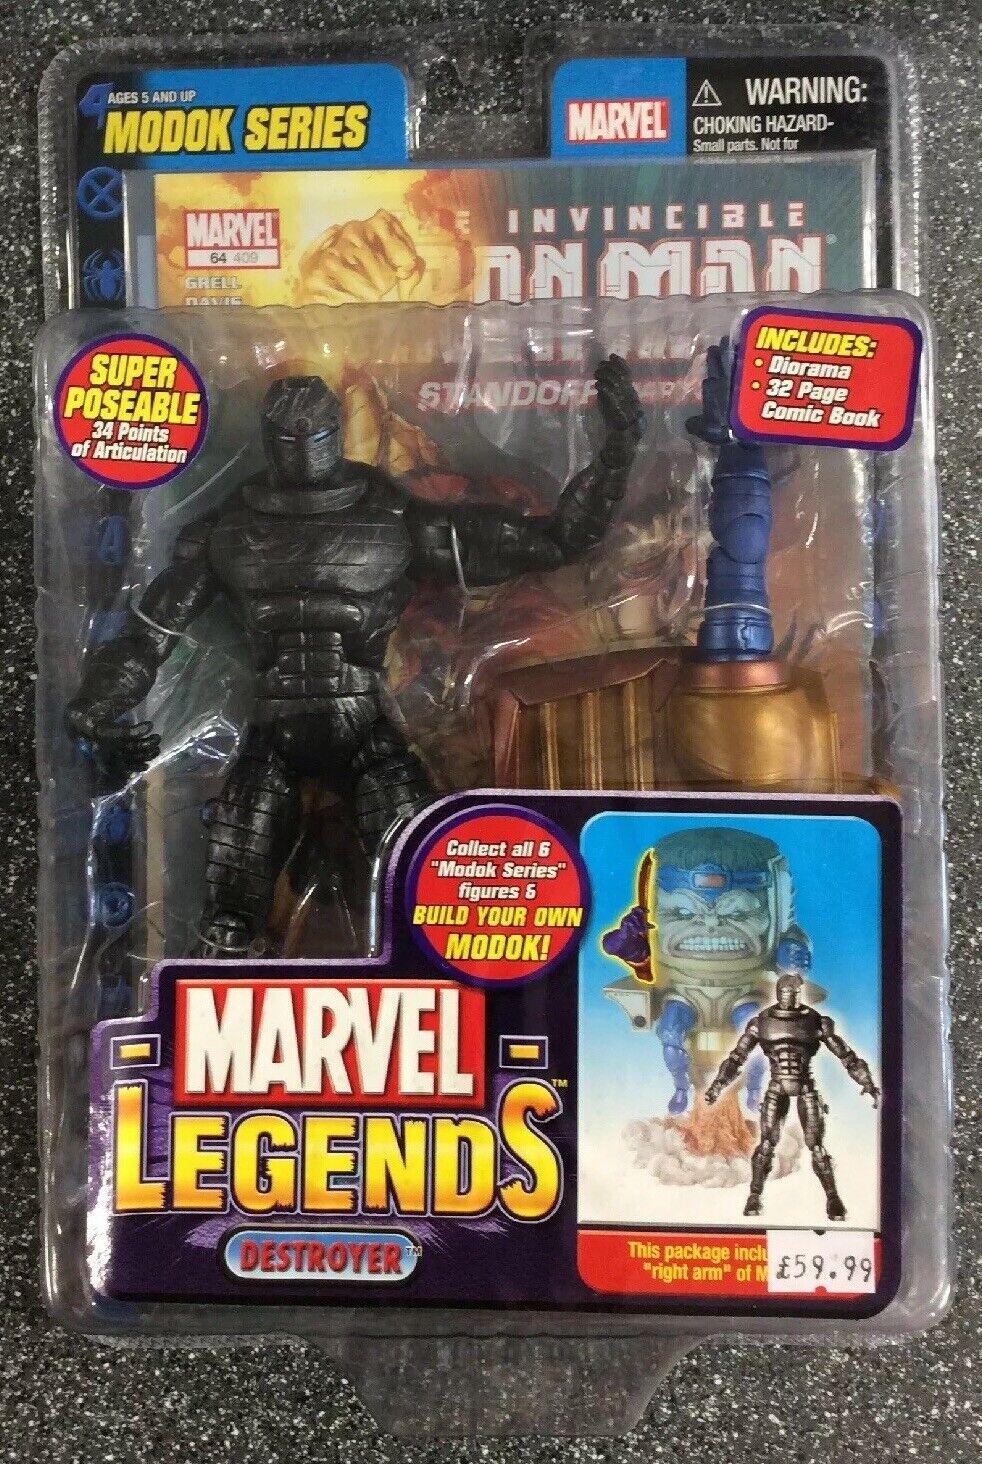 Marvel leggende  MODOK SERIES  Destroyer  acquistare ora